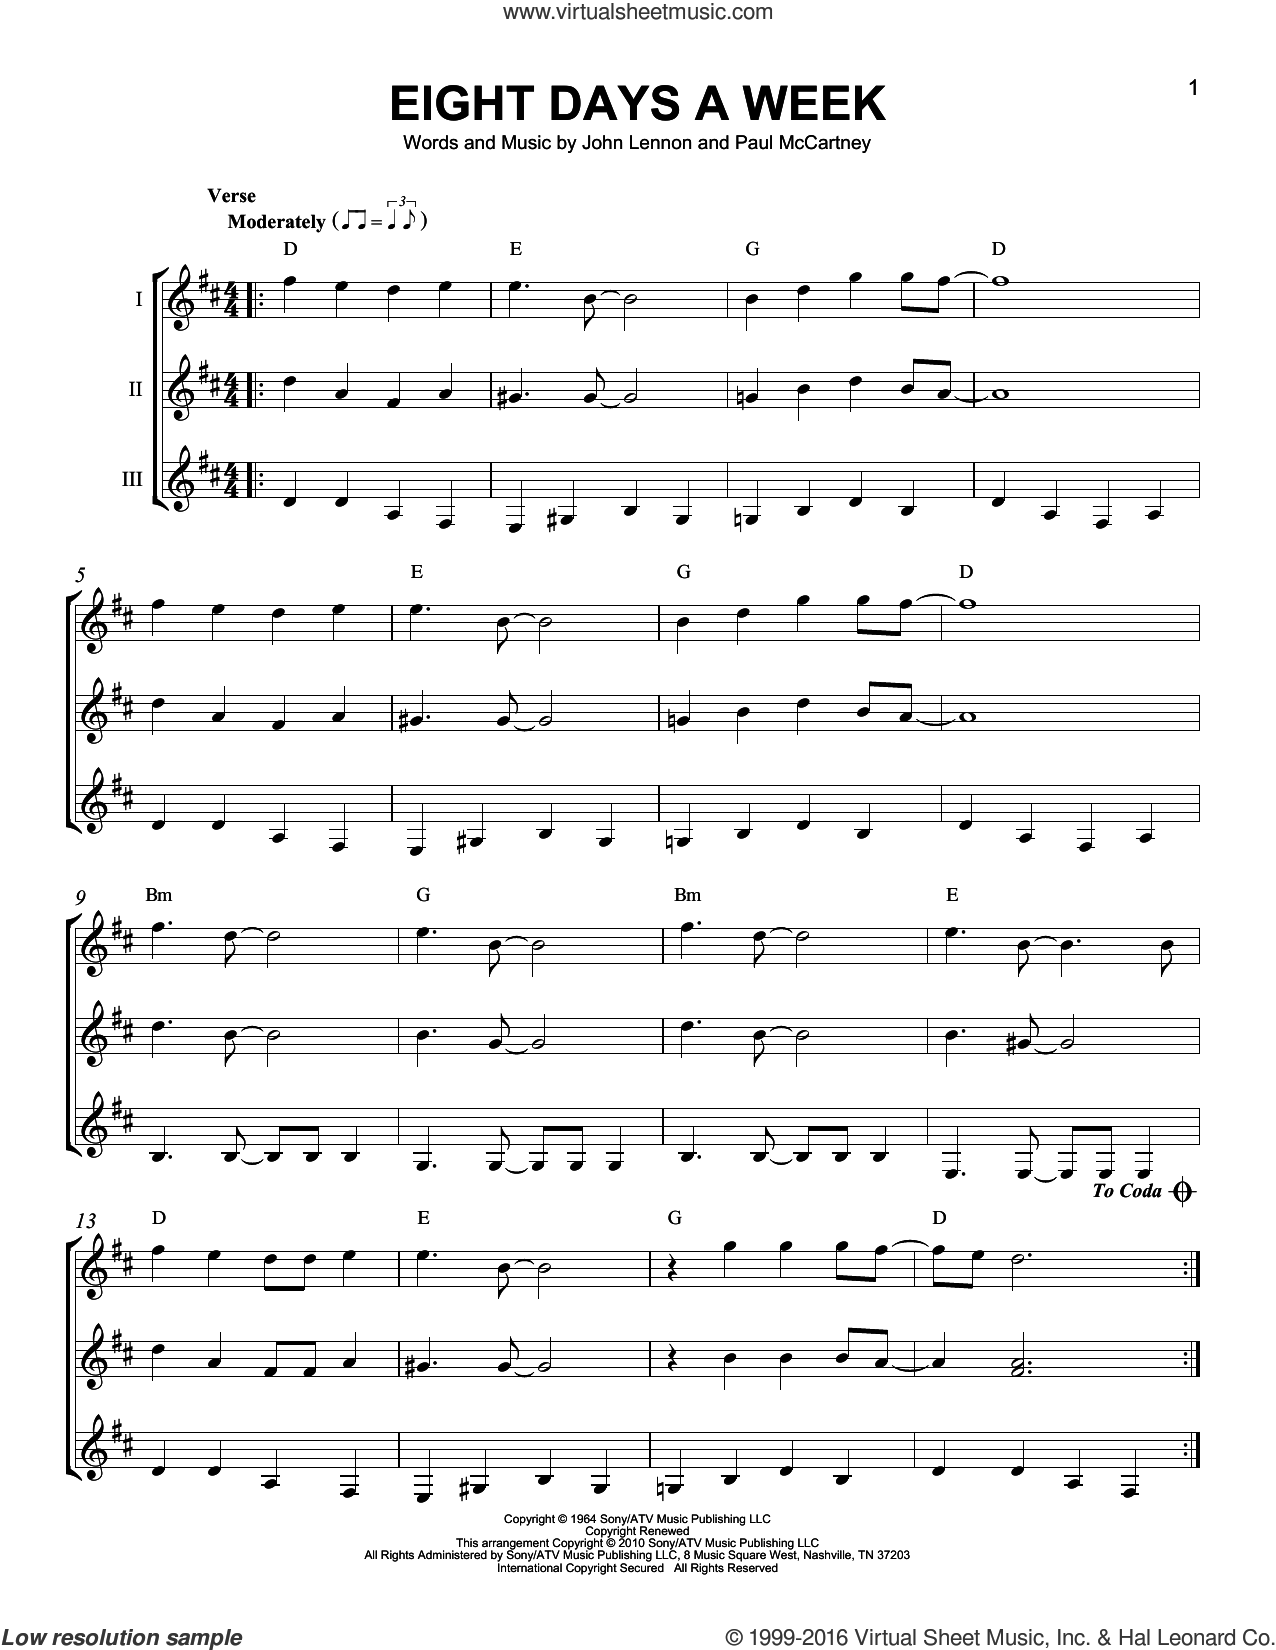 Eight Days A Week sheet music for guitar ensemble by The Beatles, John Lennon and Paul McCartney, intermediate skill level